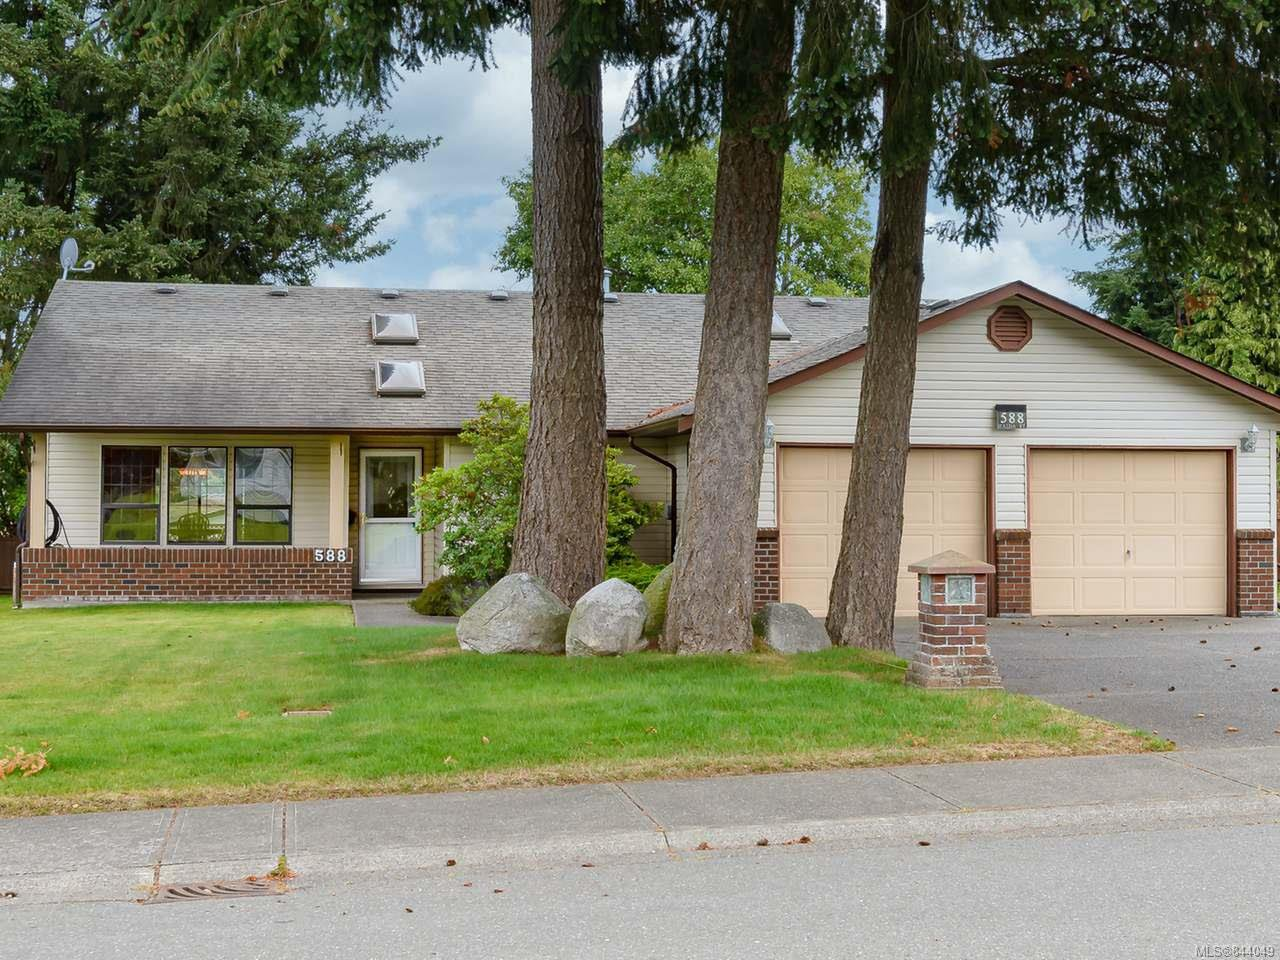 Main Photo: 588 Haida St in COMOX: CV Comox (Town of) Single Family Detached for sale (Comox Valley)  : MLS®# 844049